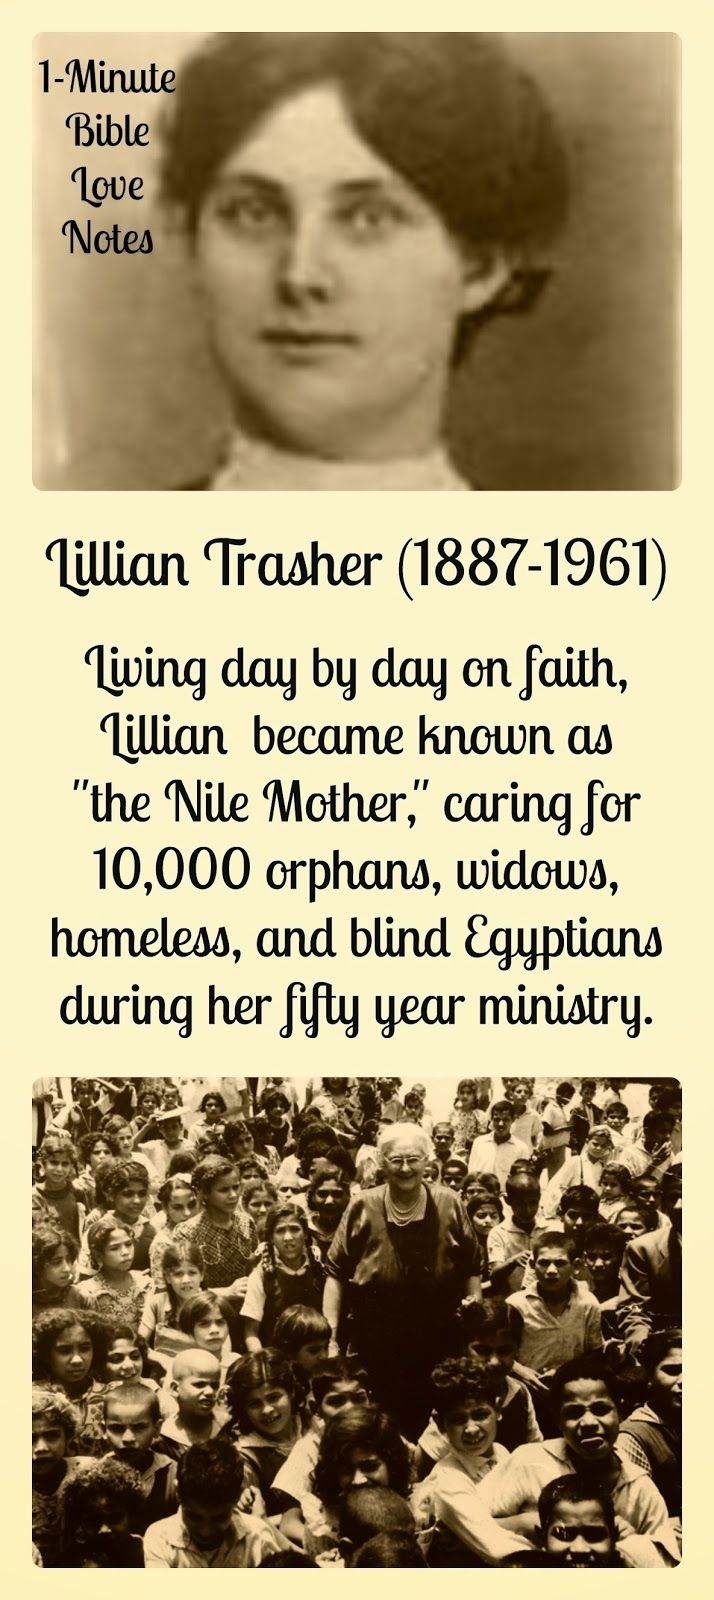 La misionera de Egipto.